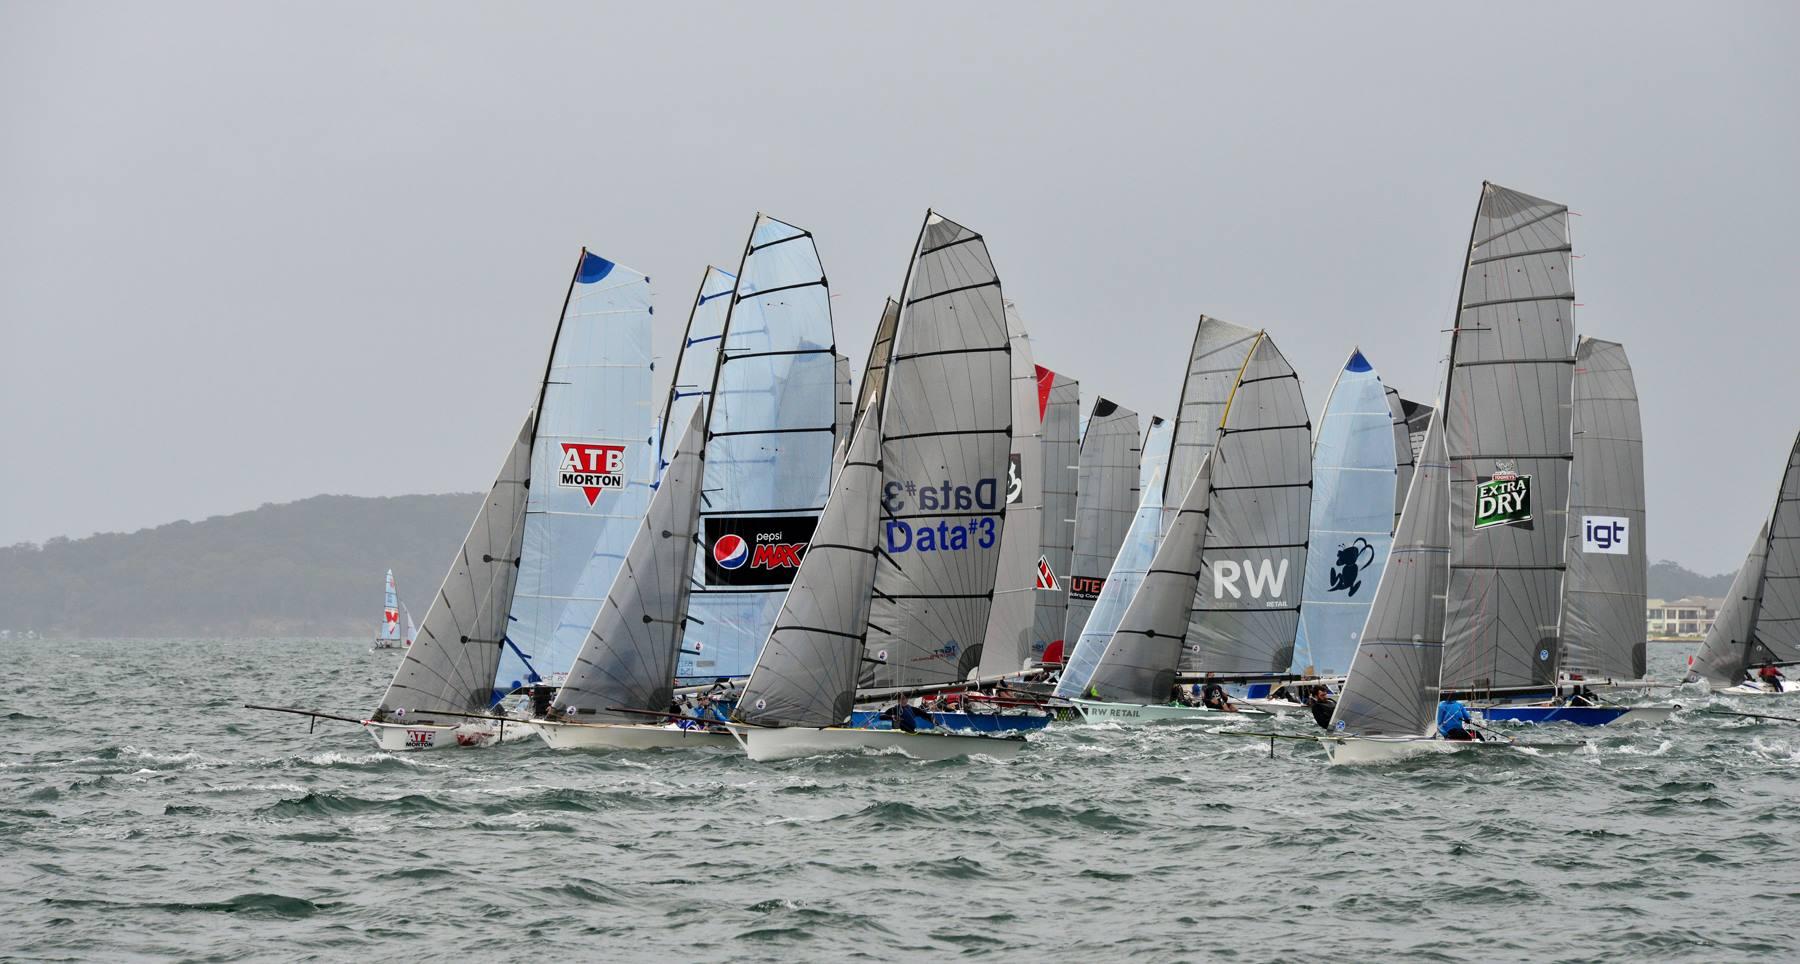 ATB Morton boat leading.jpg